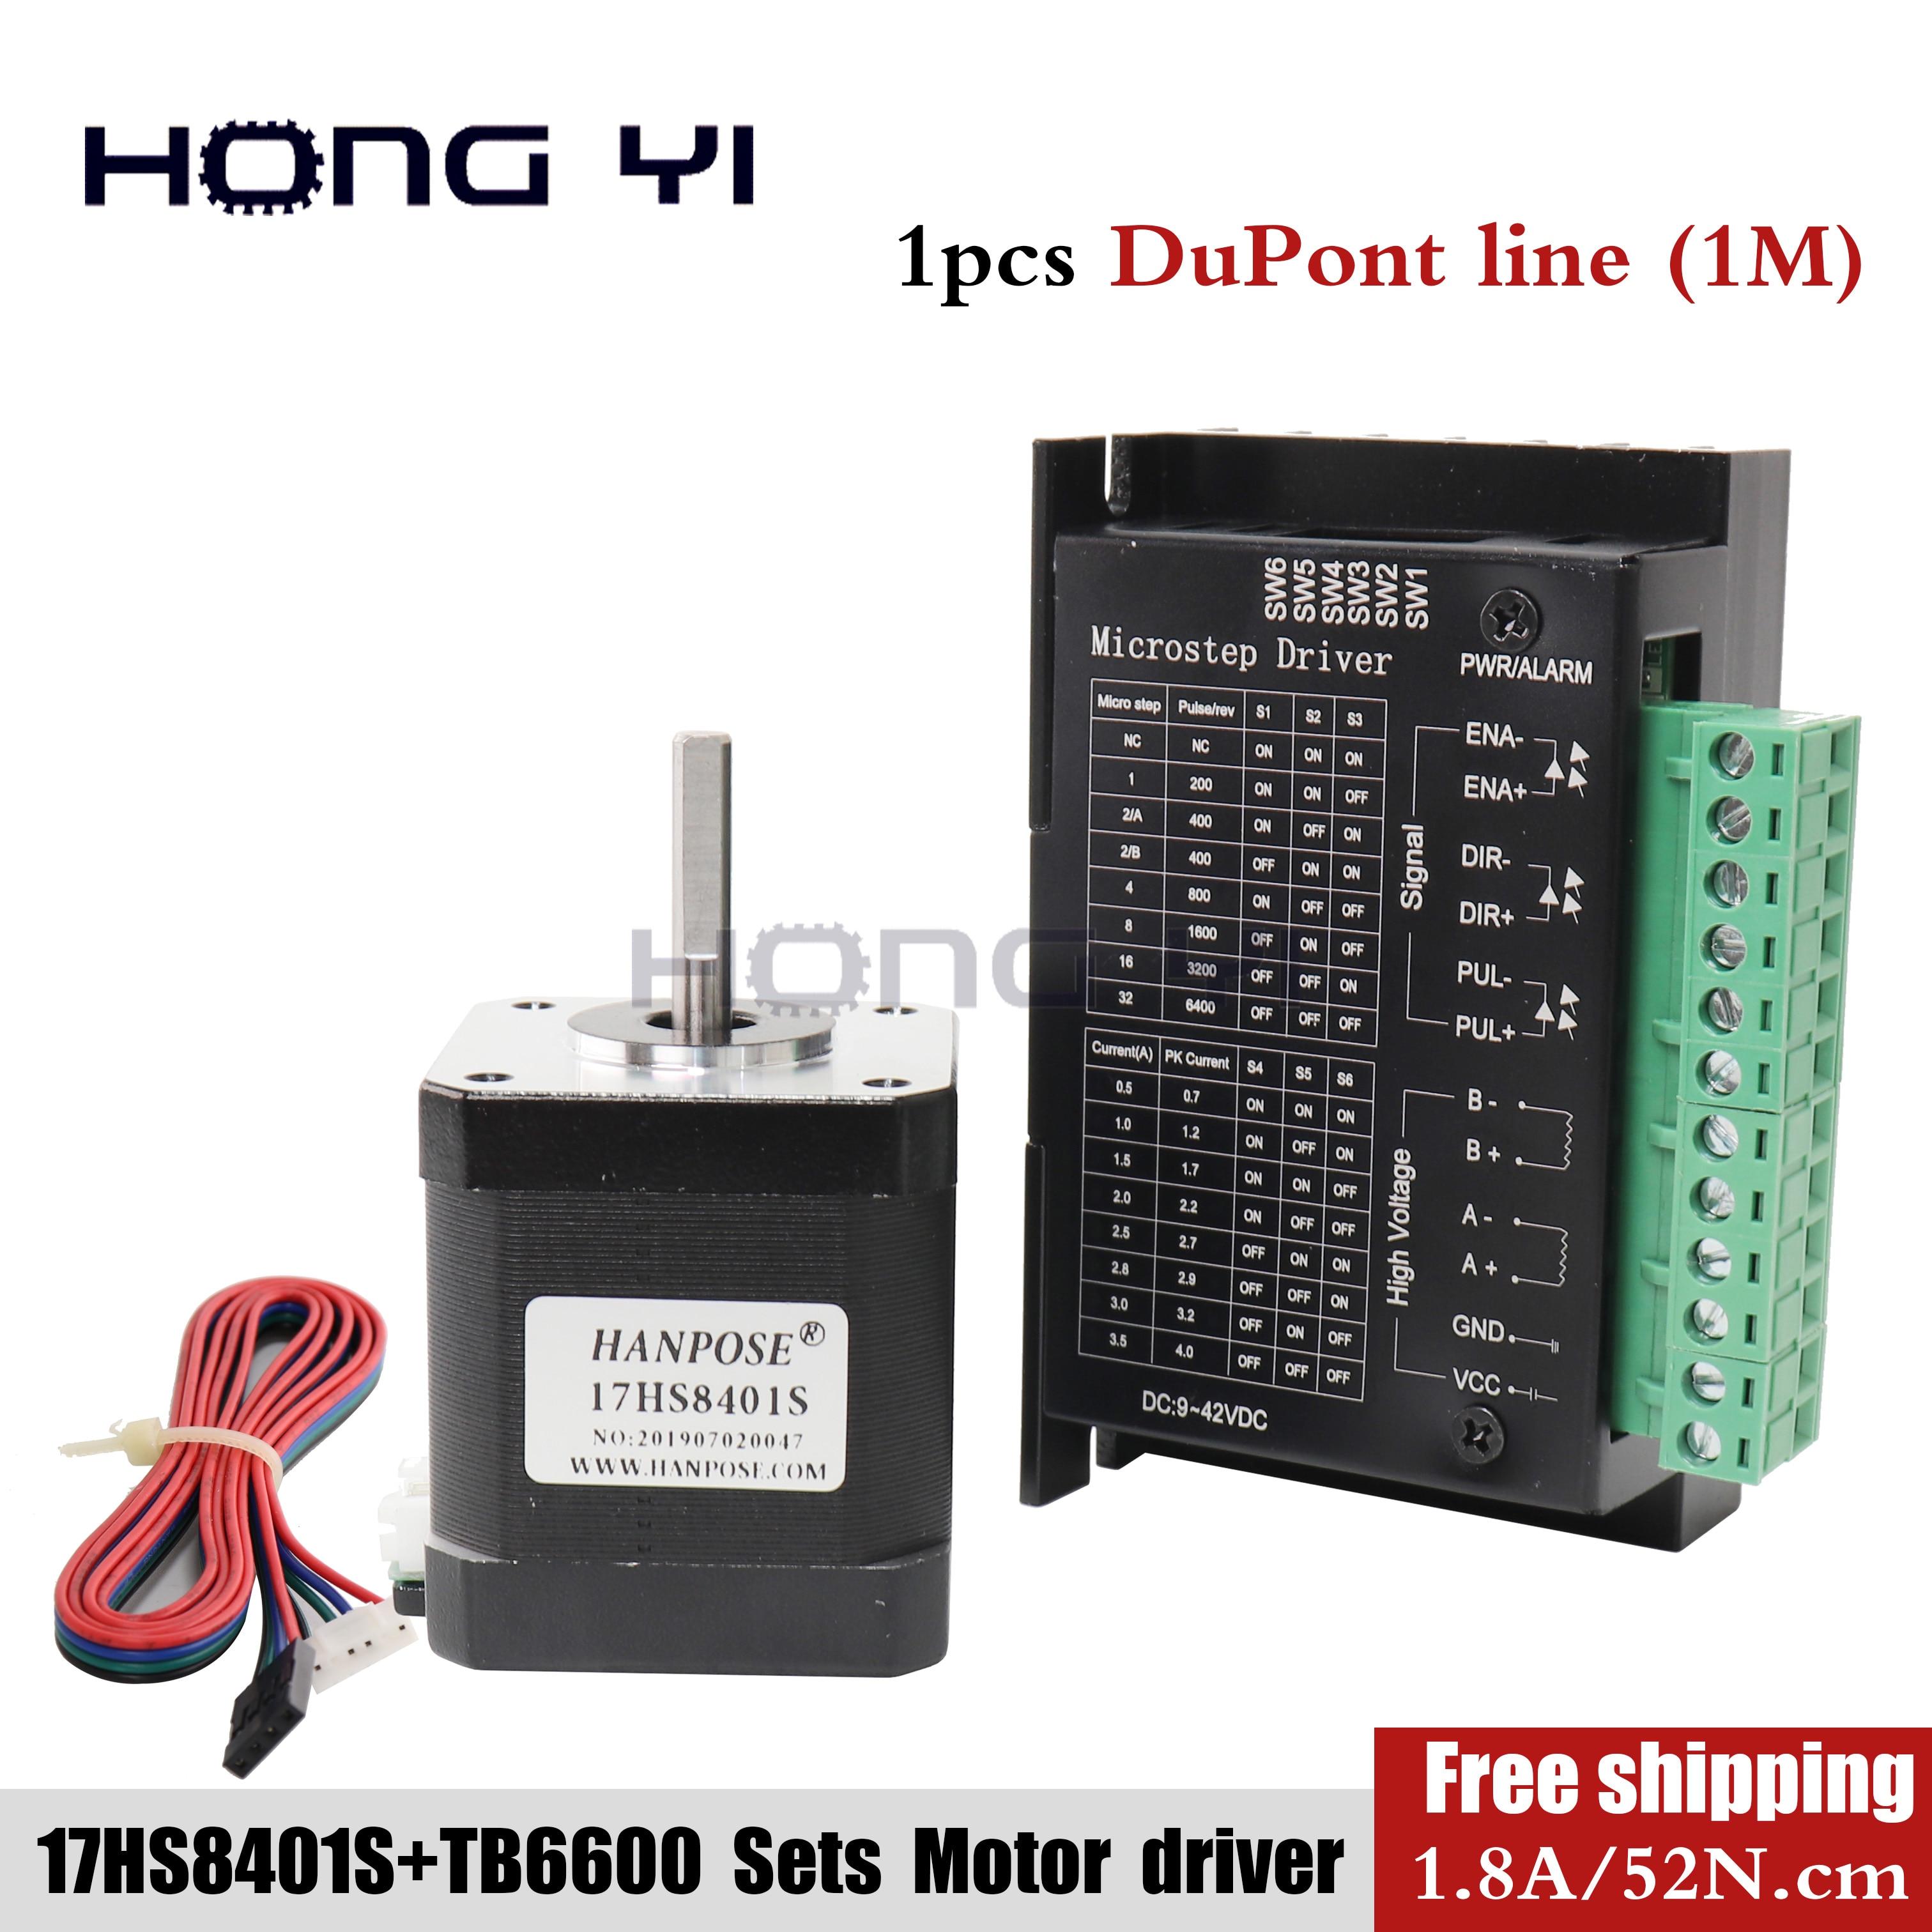 17HS8401 4-lead Nema 17 Stepper Motor driver TB6600 42 motor 42BYGHA 1.8A 52N.cm CE CNC Laser and 3D printer motor